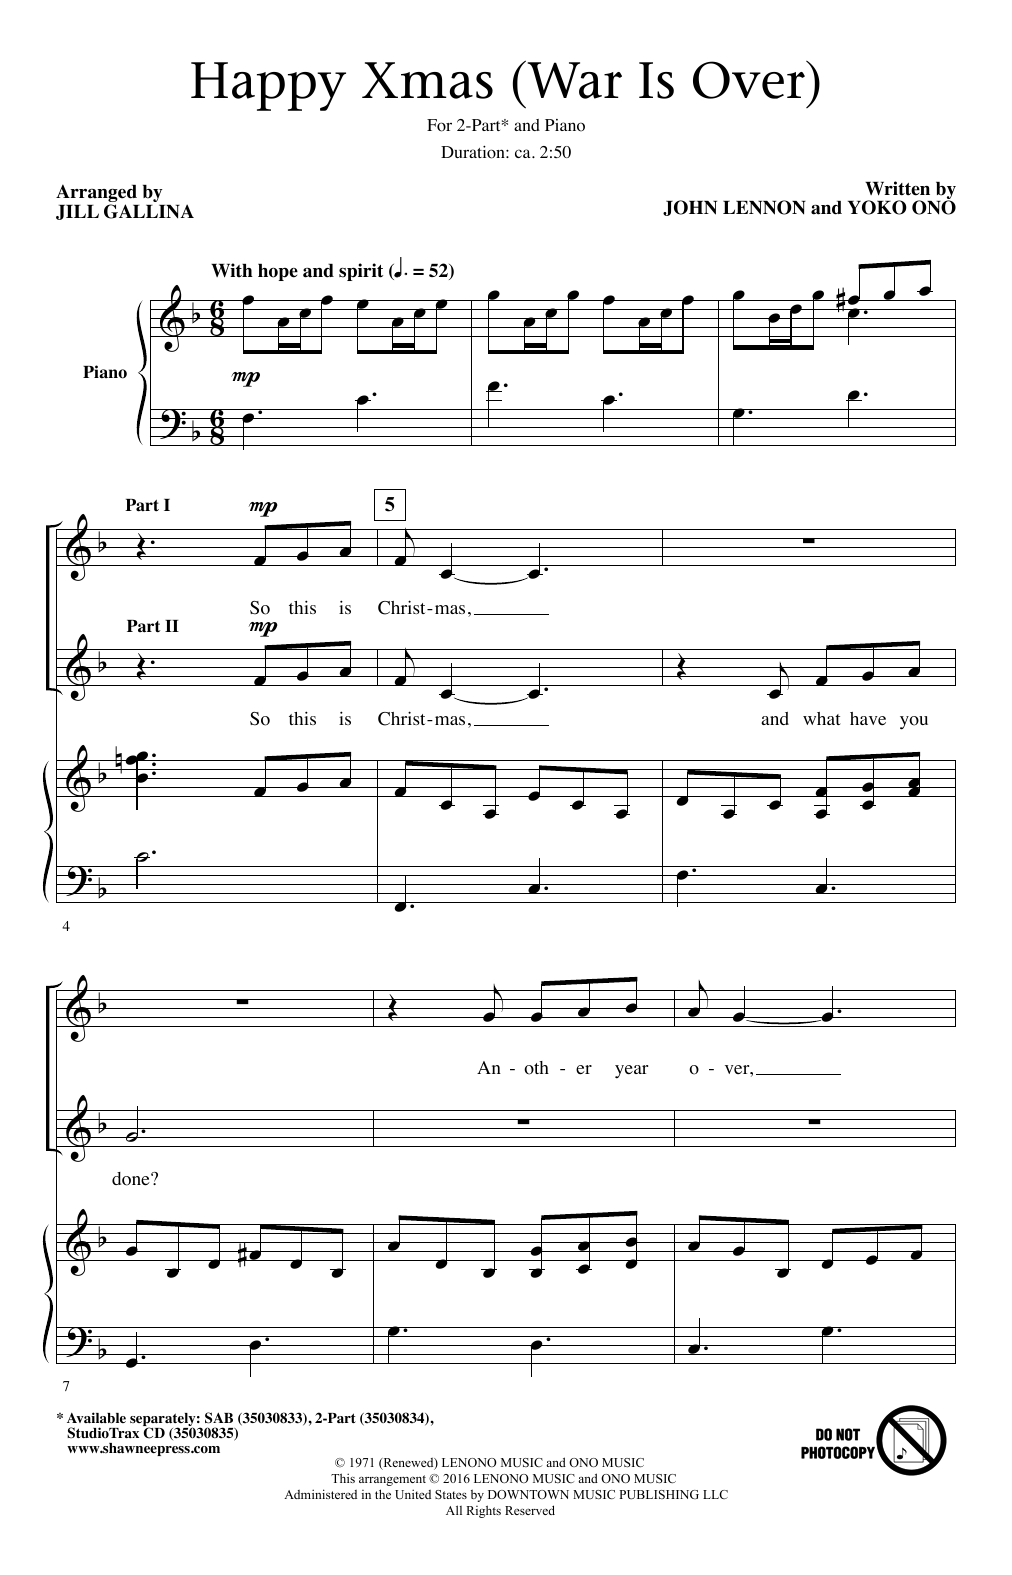 John Lennon Happy Xmas War Is Over Arr Jill Gallina Sheet Music Pdf Notes Chords Christmas Score 2 Part Choir Download Printable Sku 195638